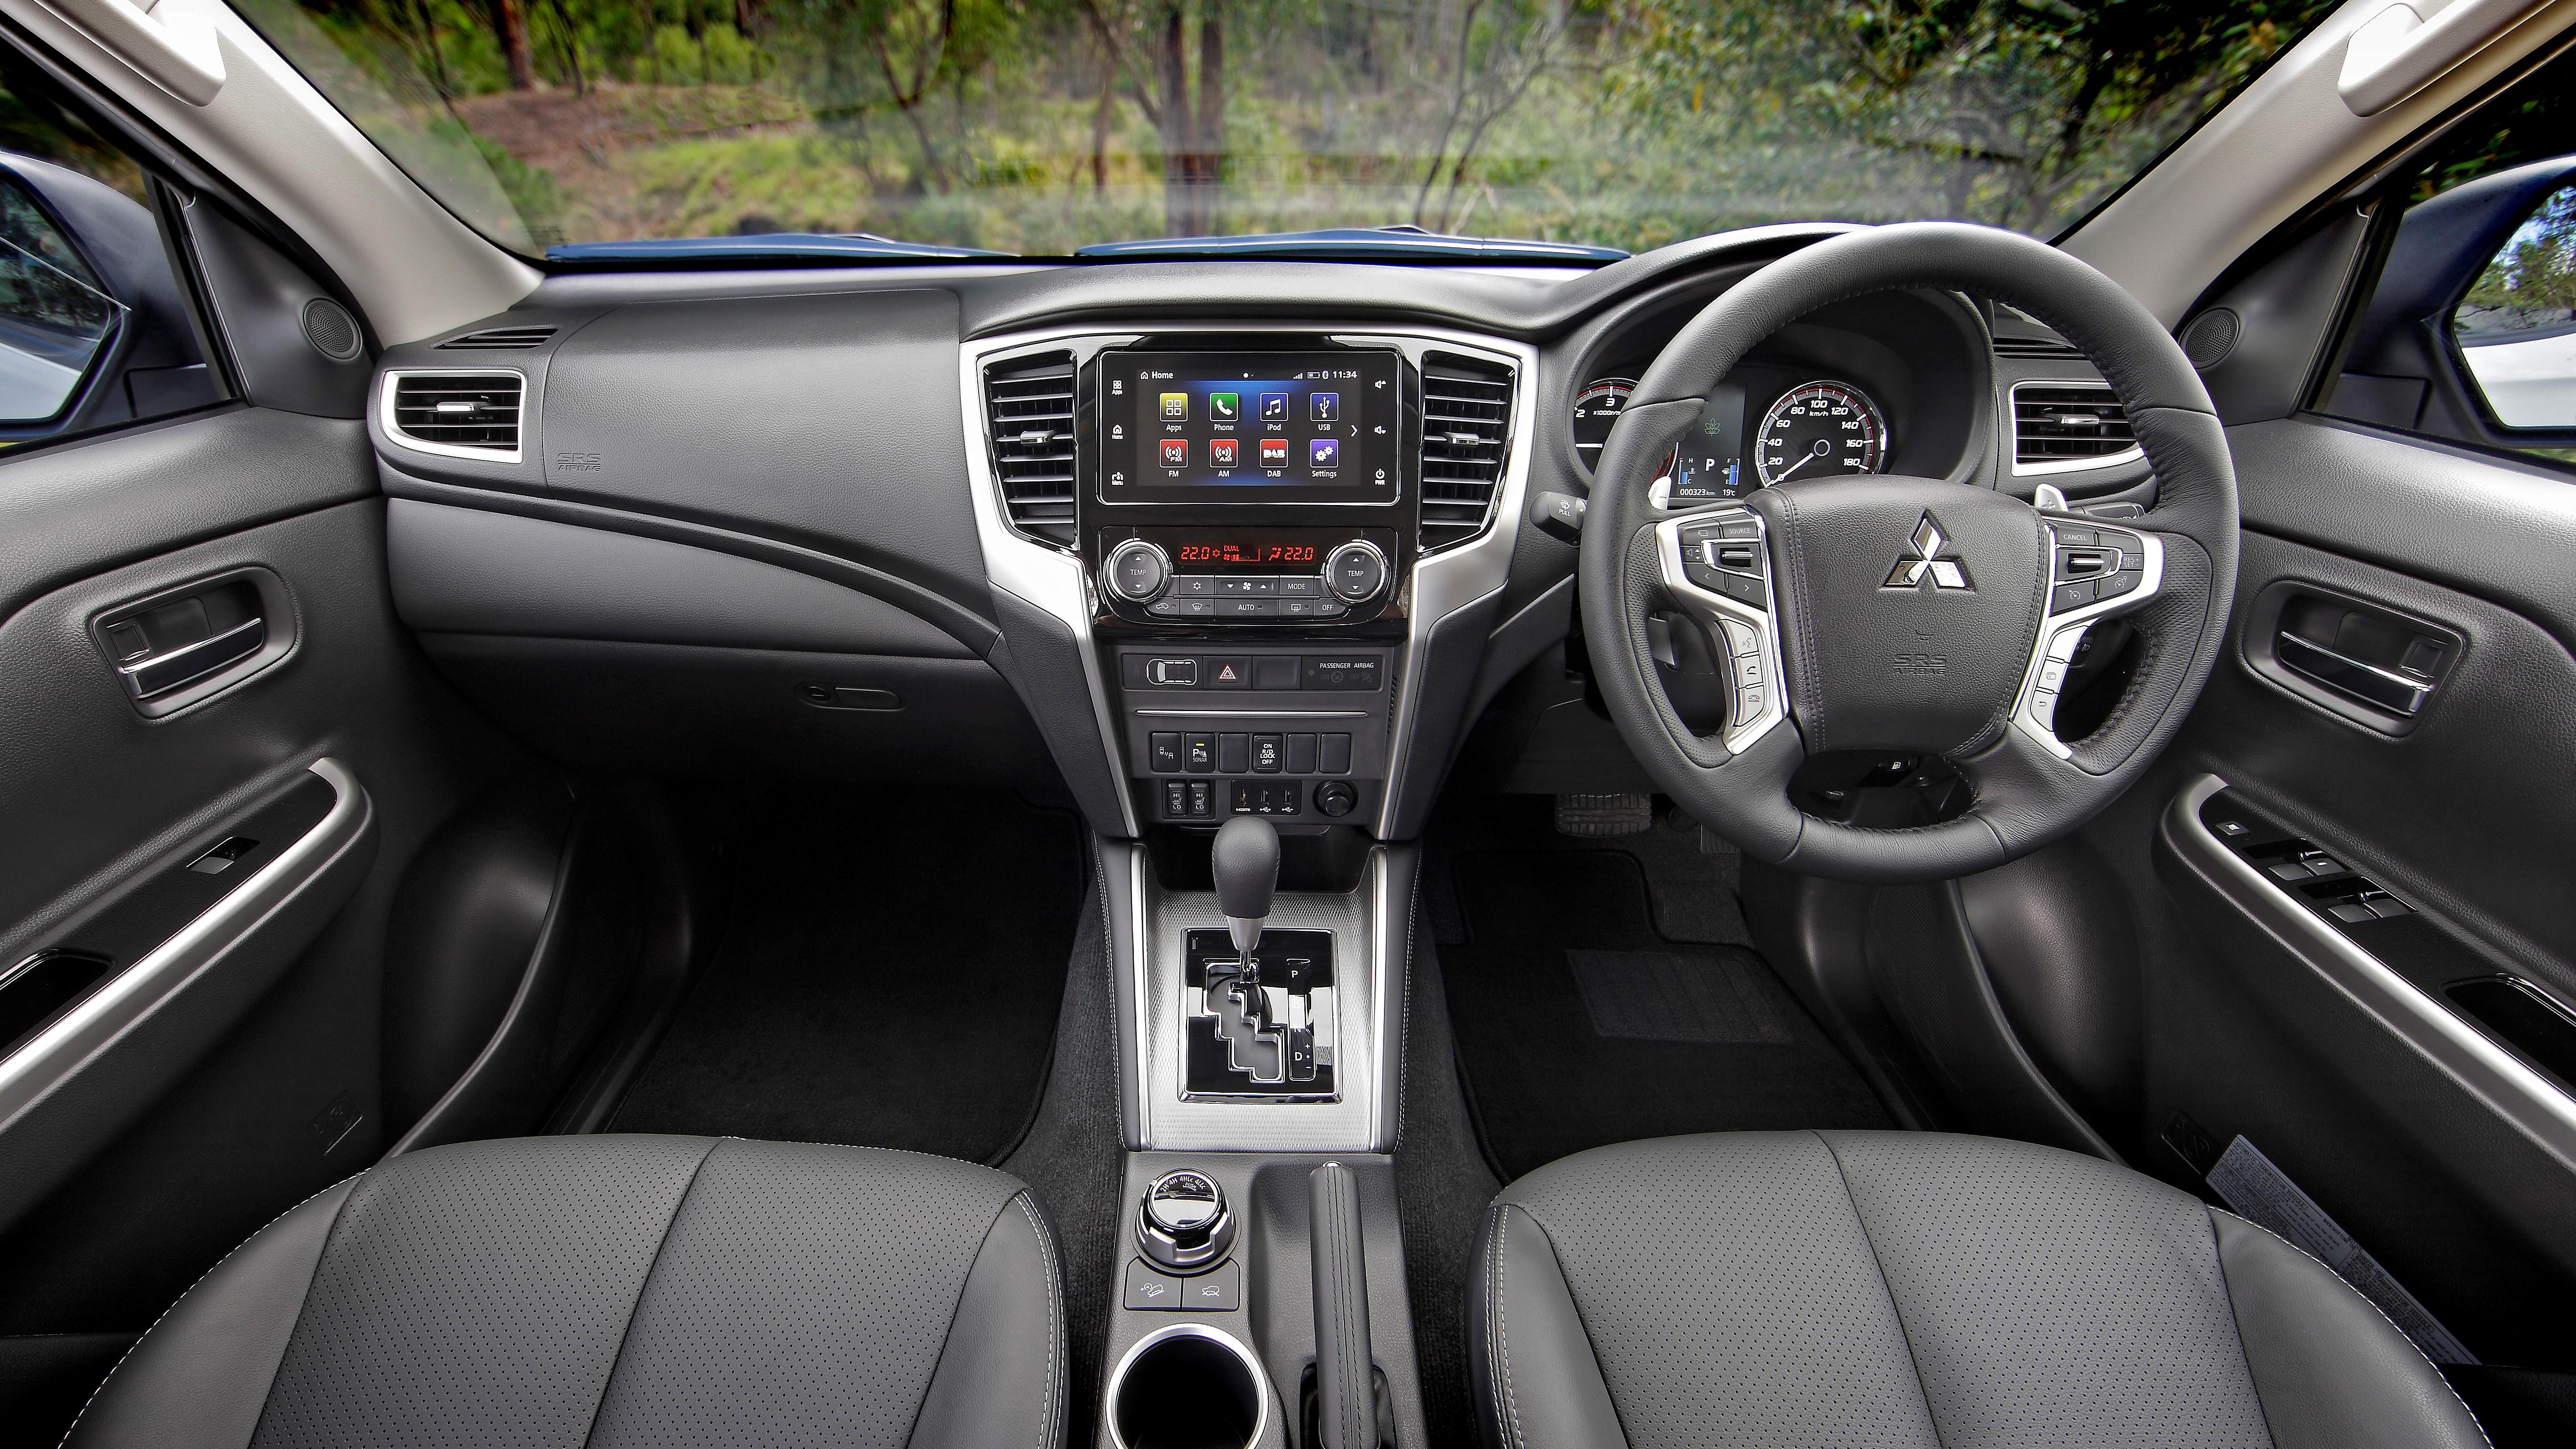 2019 Mitsubishi Triton first Australian drive